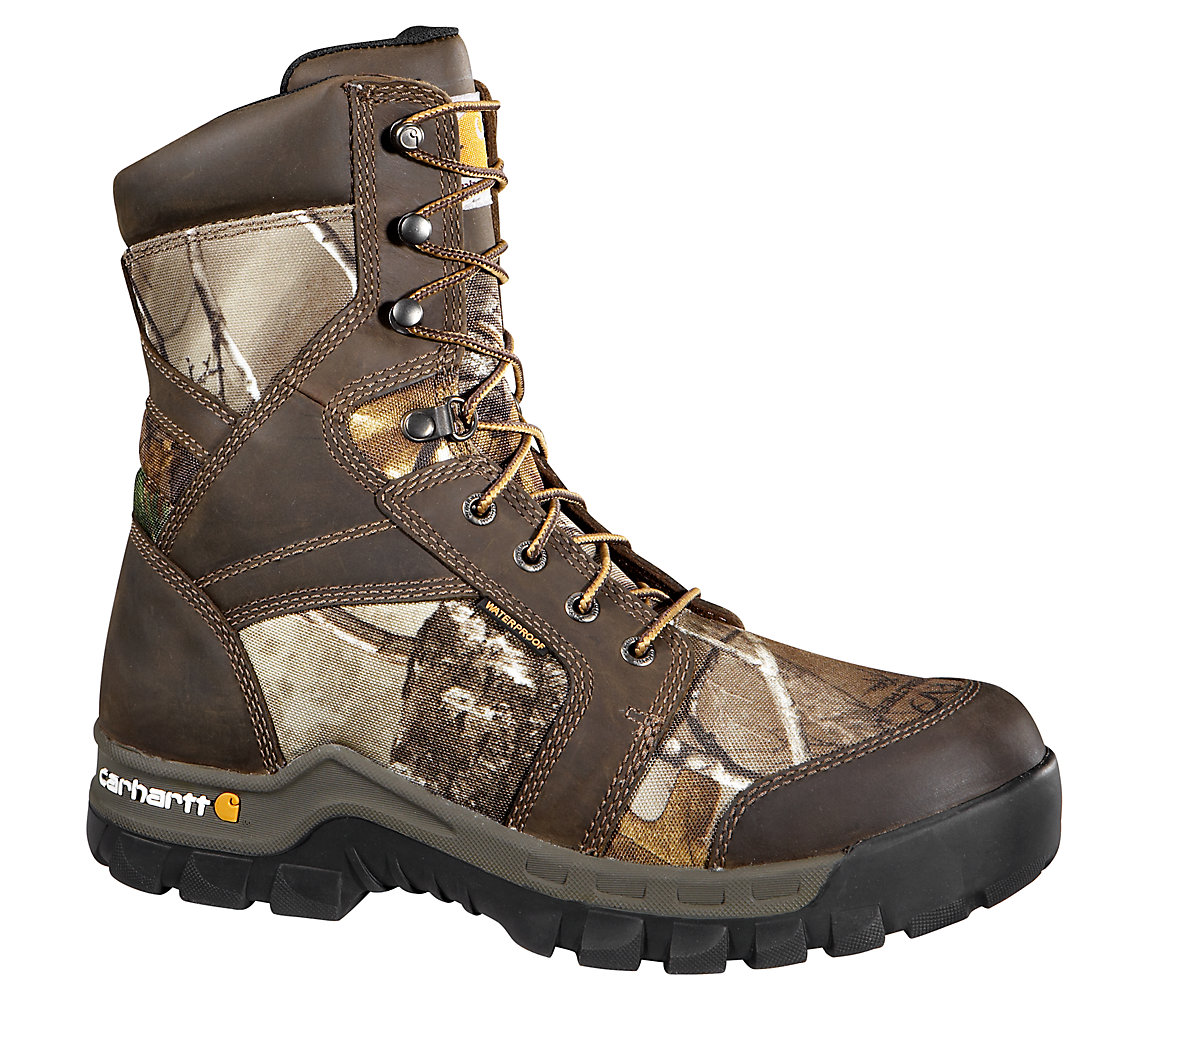 Carhartt CMF8379 Composite Toe